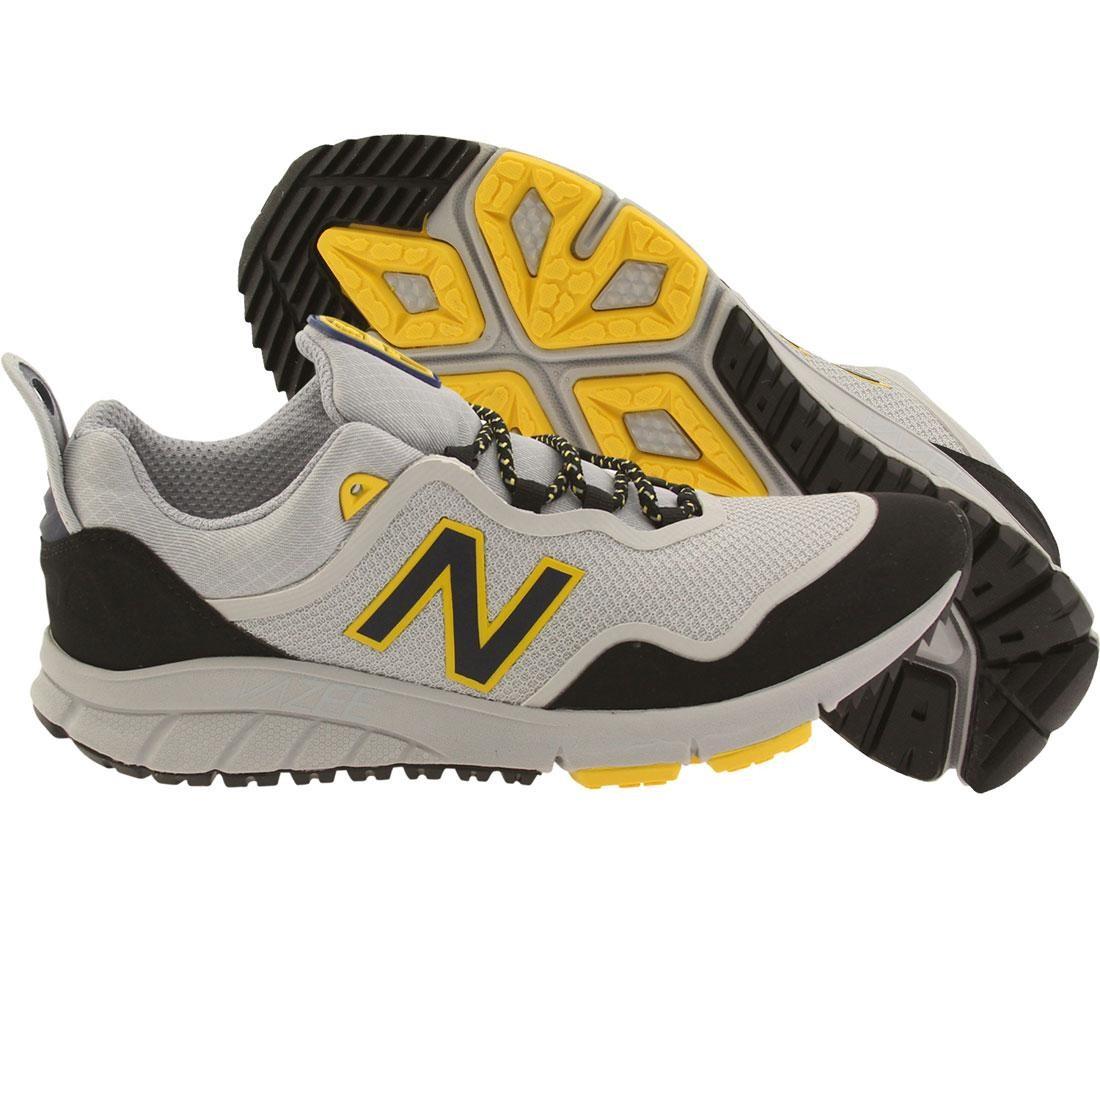 e26bb4cd791a9 New Balance Men 801 Vazee Outdoor MVL801AG gray micro chip black yellow